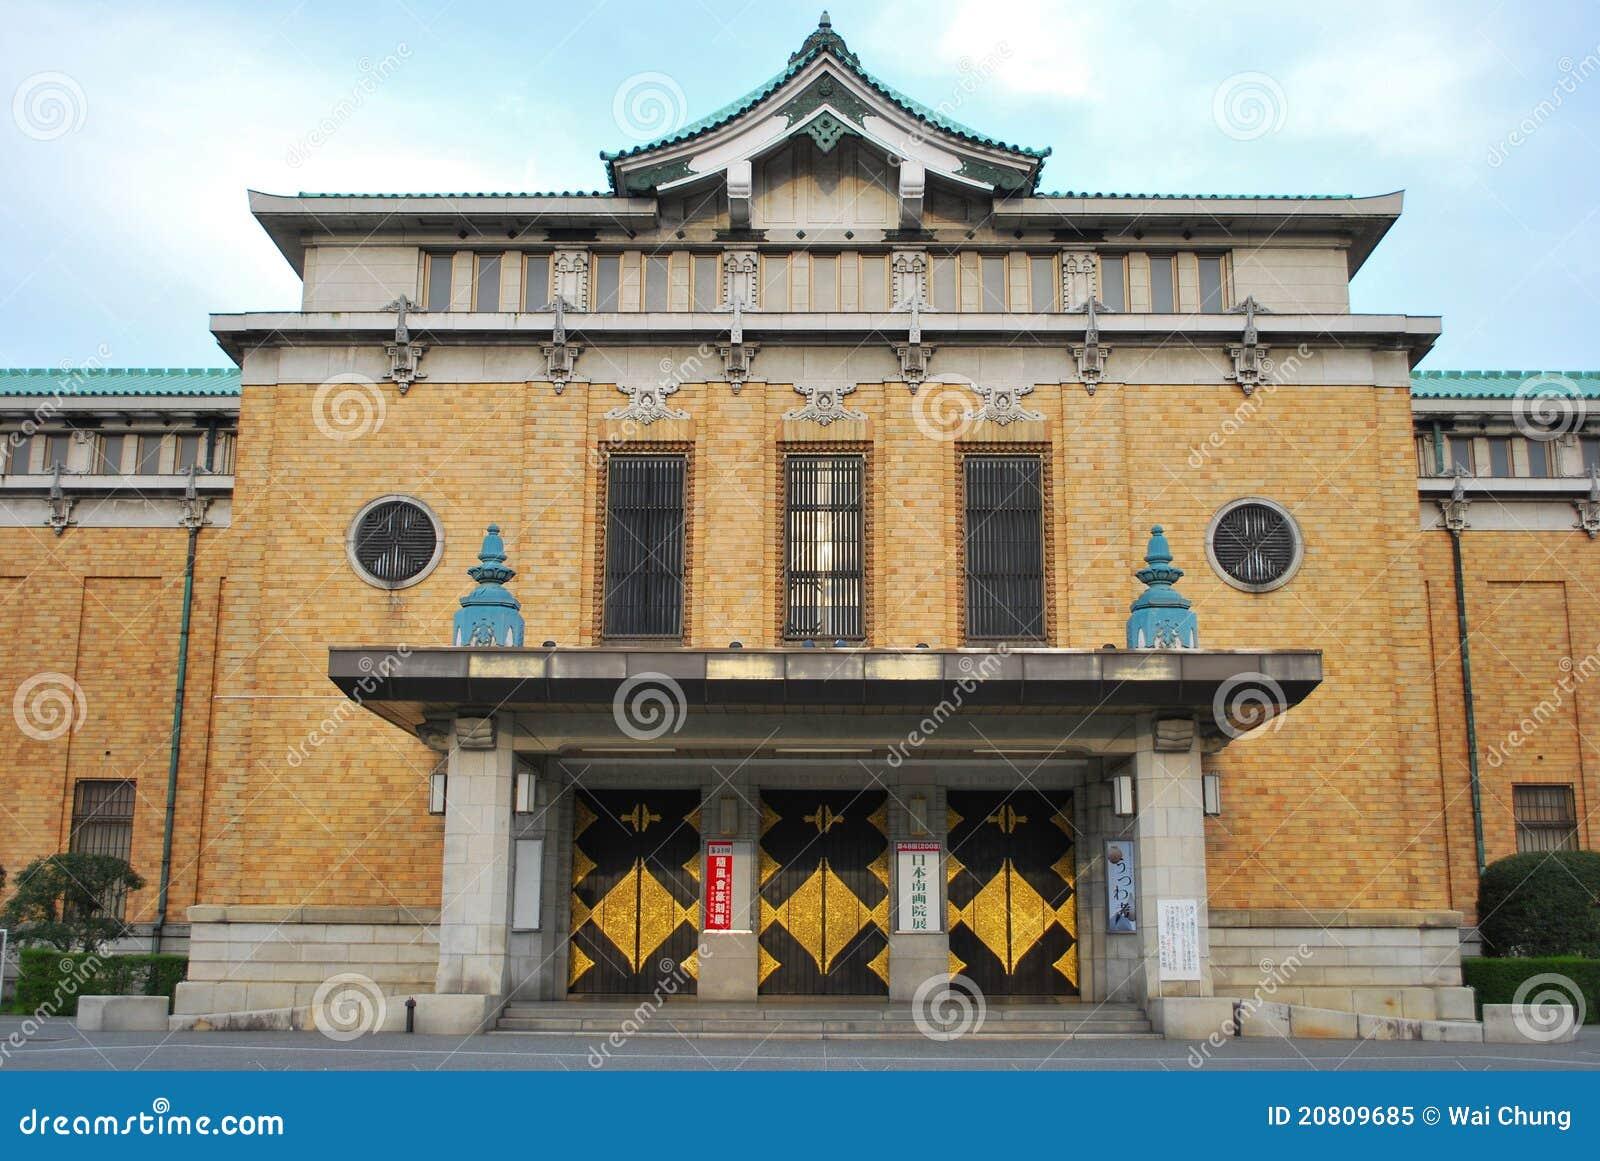 Kyoto Municipal Museum Of Art Editorial Image - Image ...